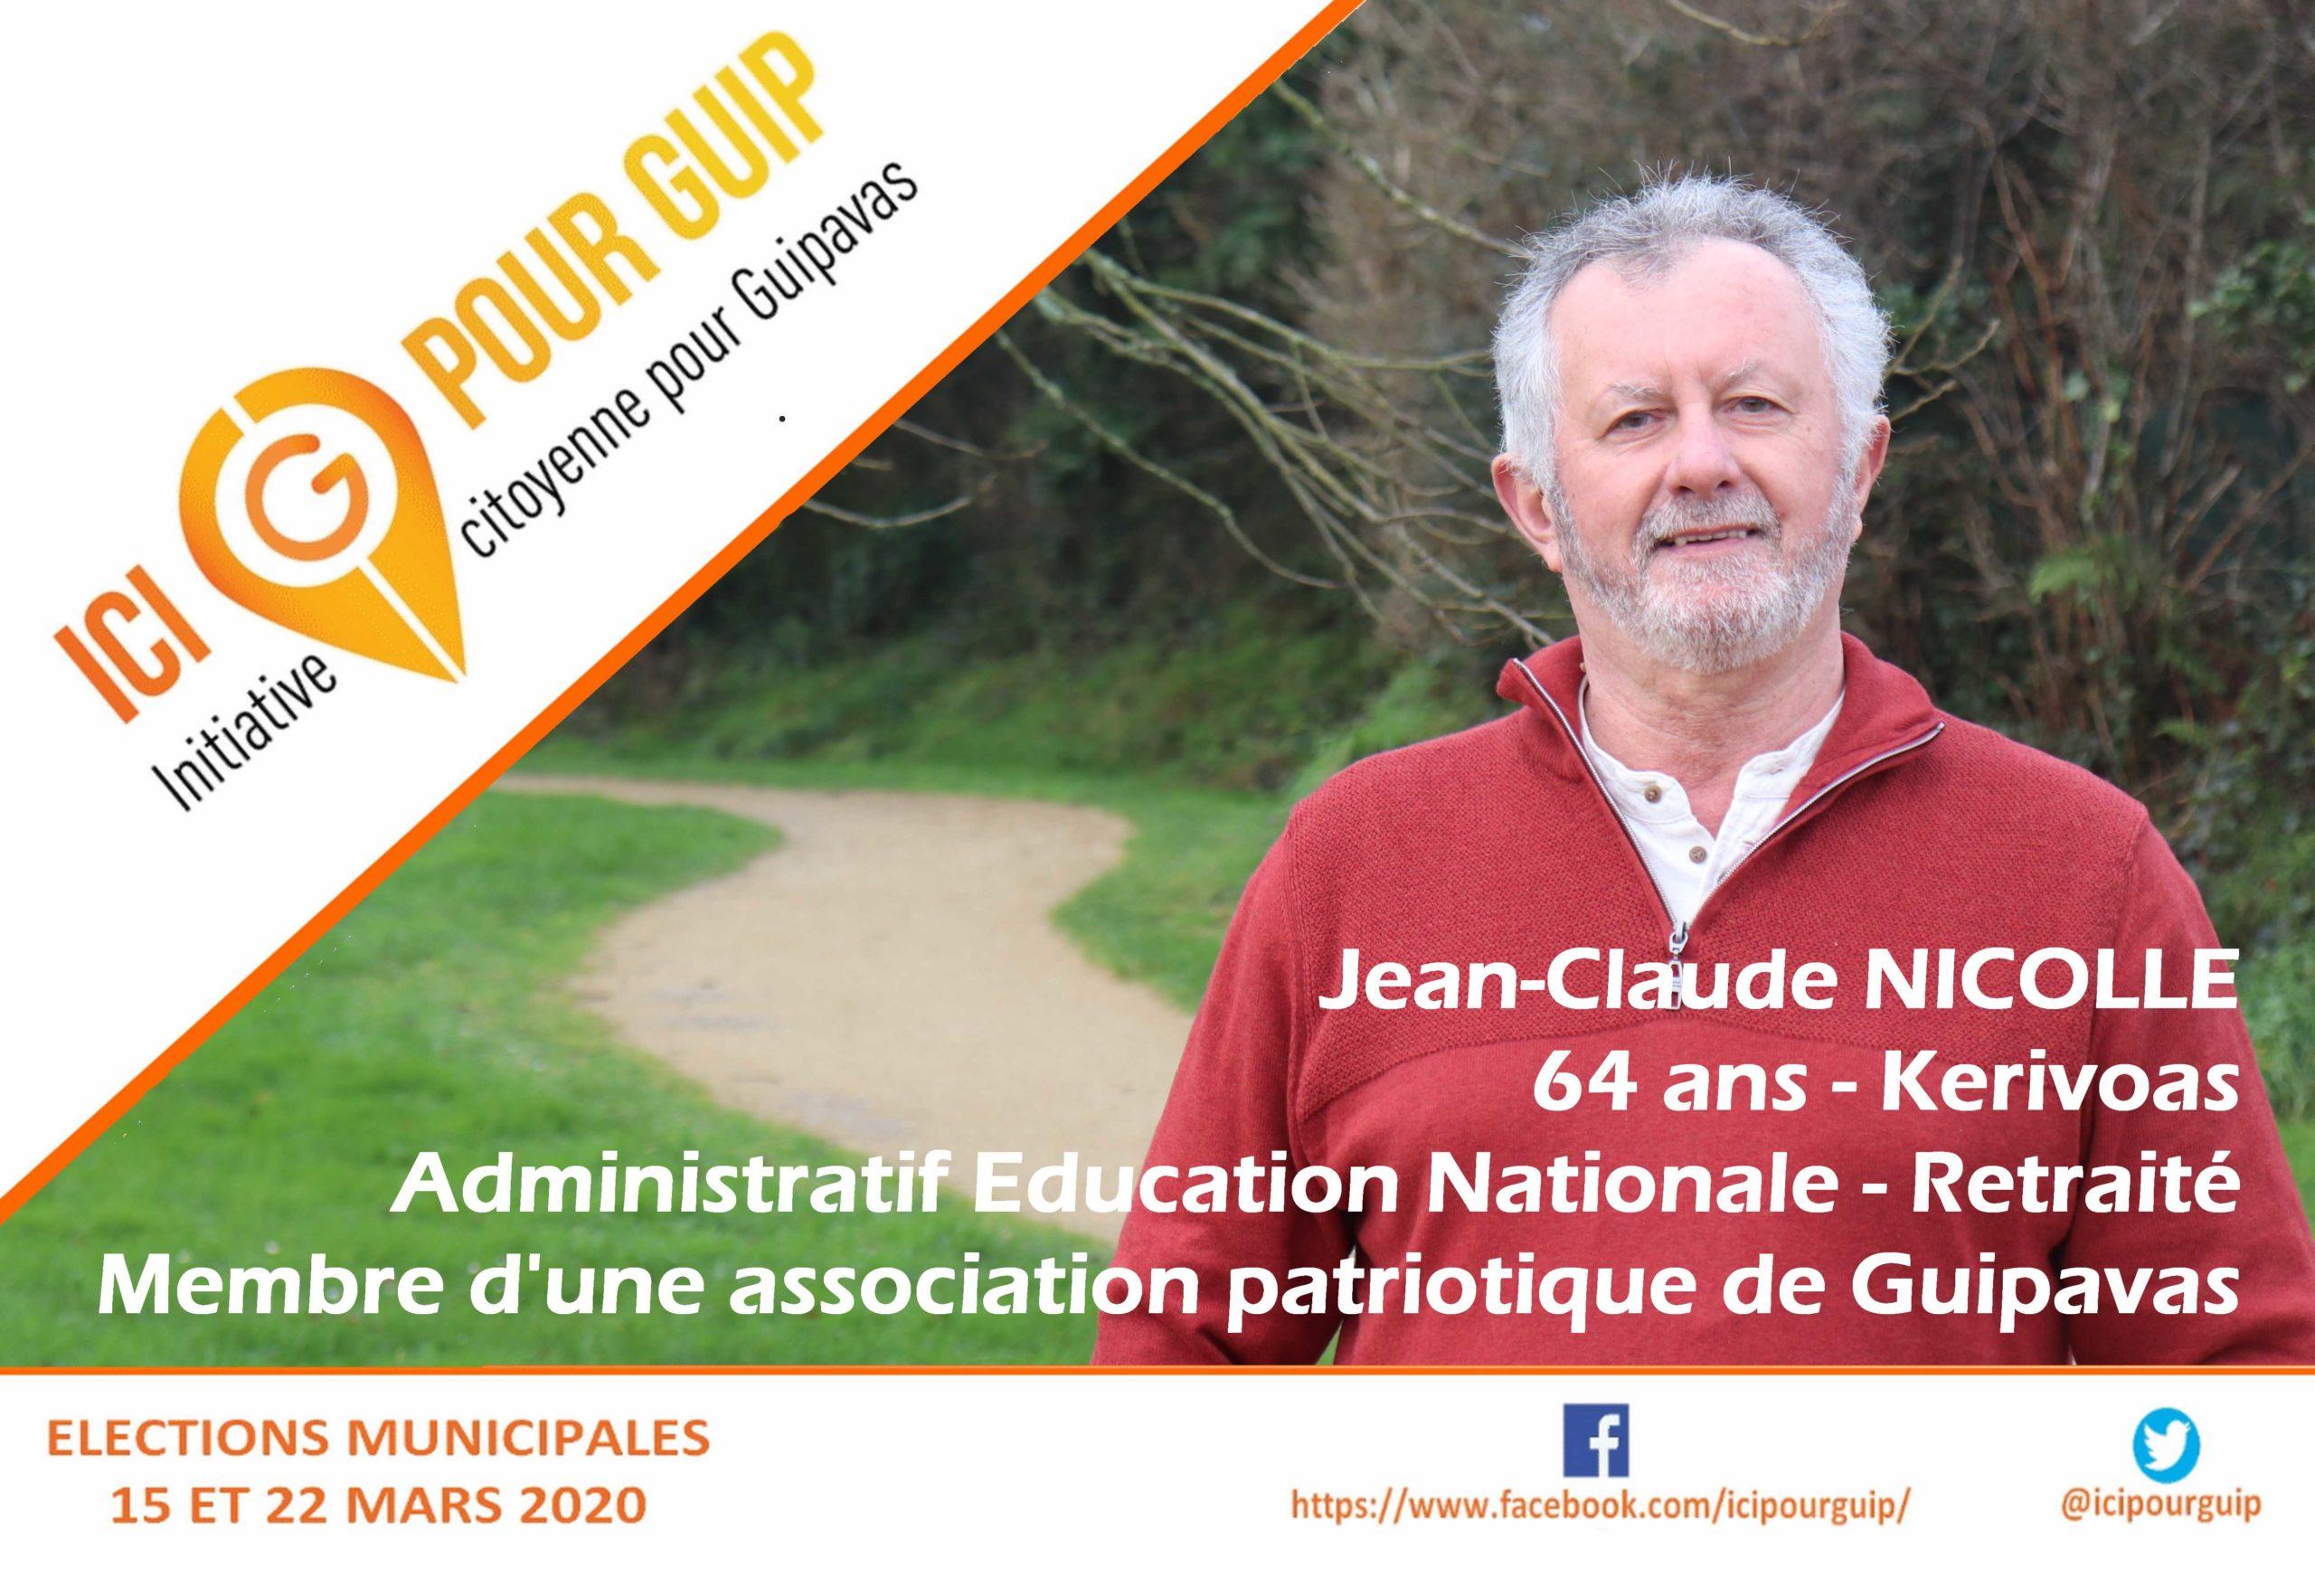 Jean-Claude Nicolle